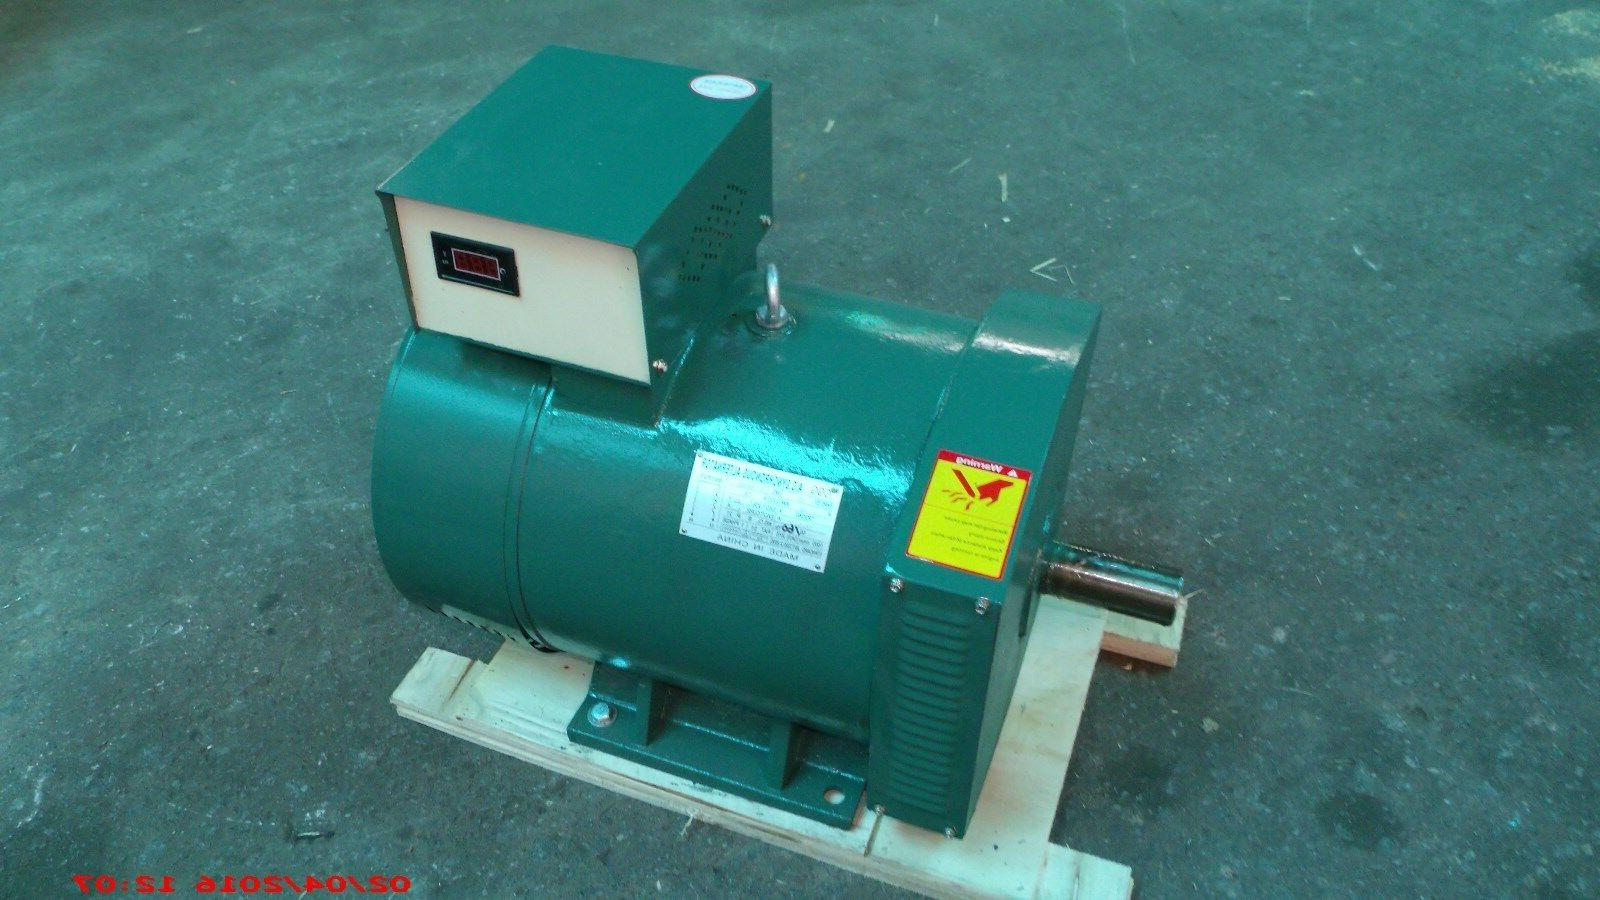 5kw st generator head 1 phase